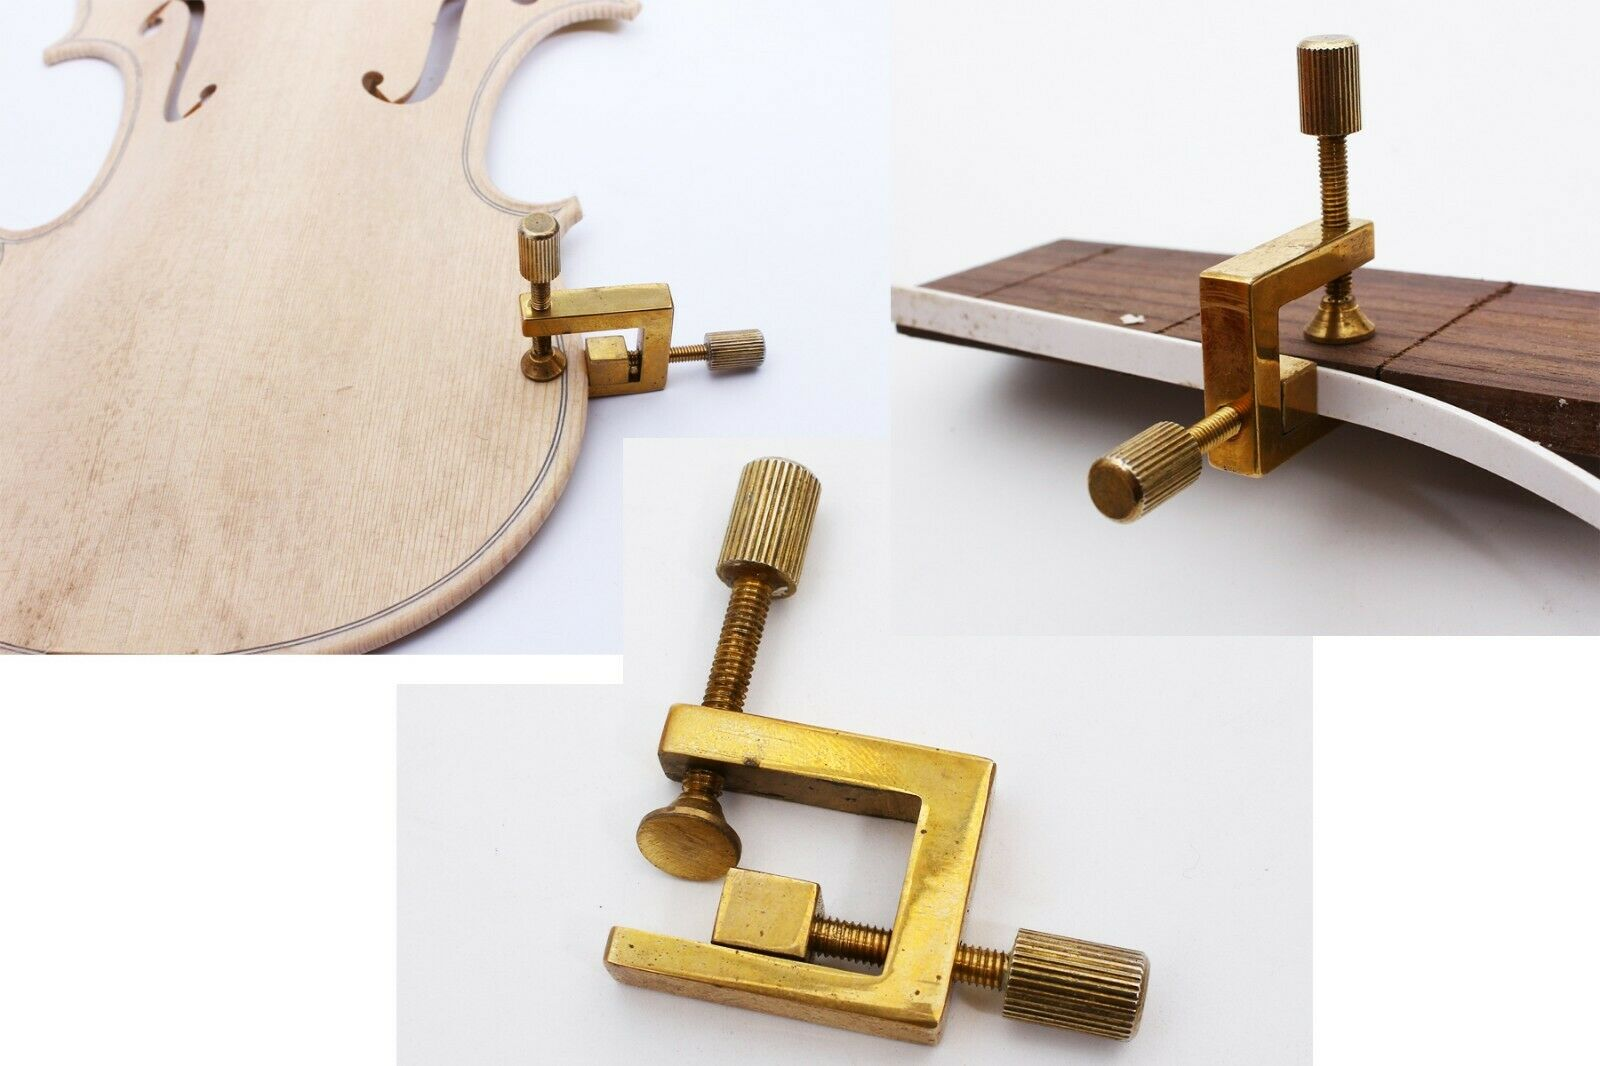 Ferramenta de Tomada de Violino Cola Grampos de Guitarra de Bronze